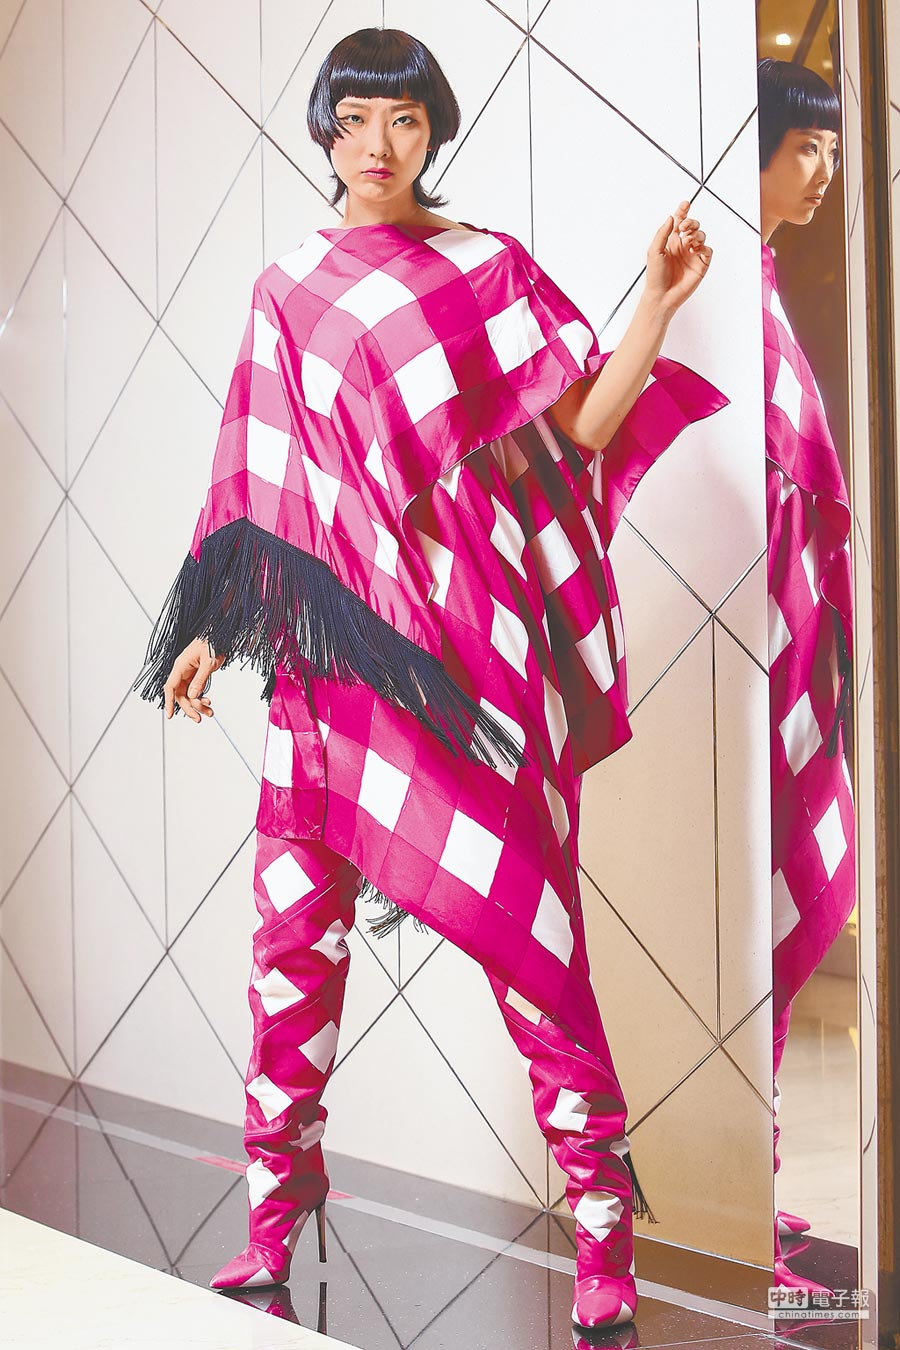 BALENCIAGA早秋系列藉方巾披掛來營造服飾變化,粉色格紋洋裝7萬7300元、粉色格紋長靴5萬7900元。(鄧博仁攝)